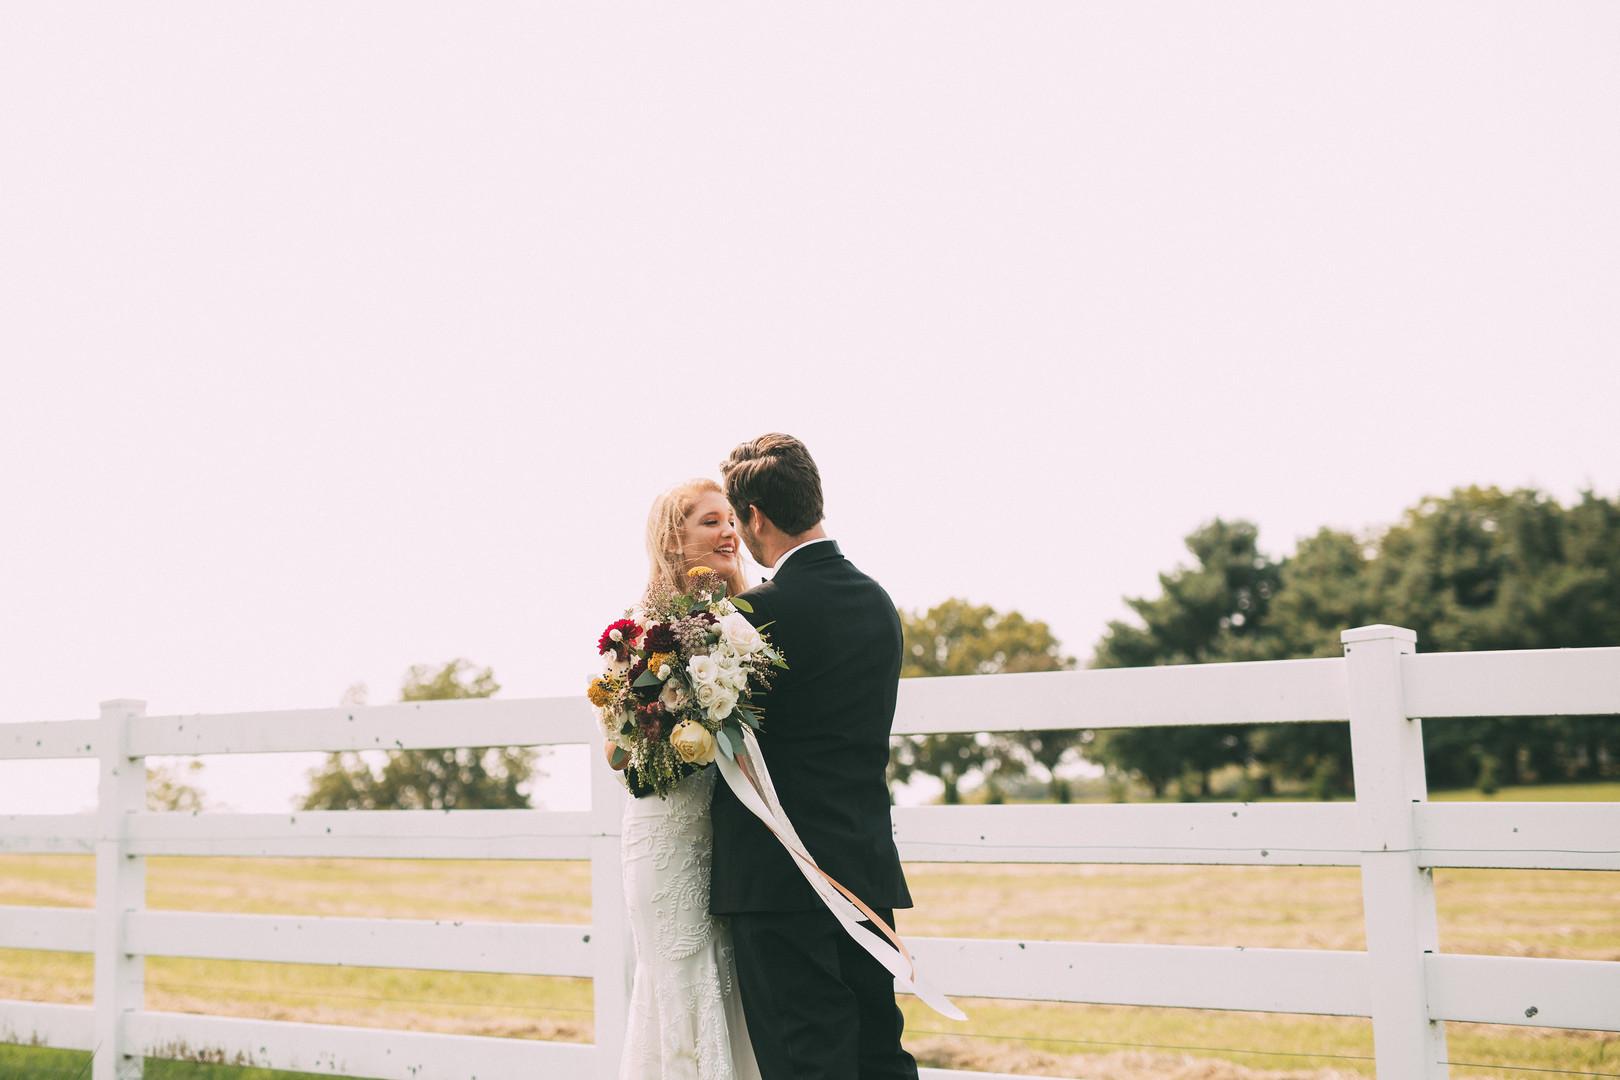 höst+bröllop+september+first+look